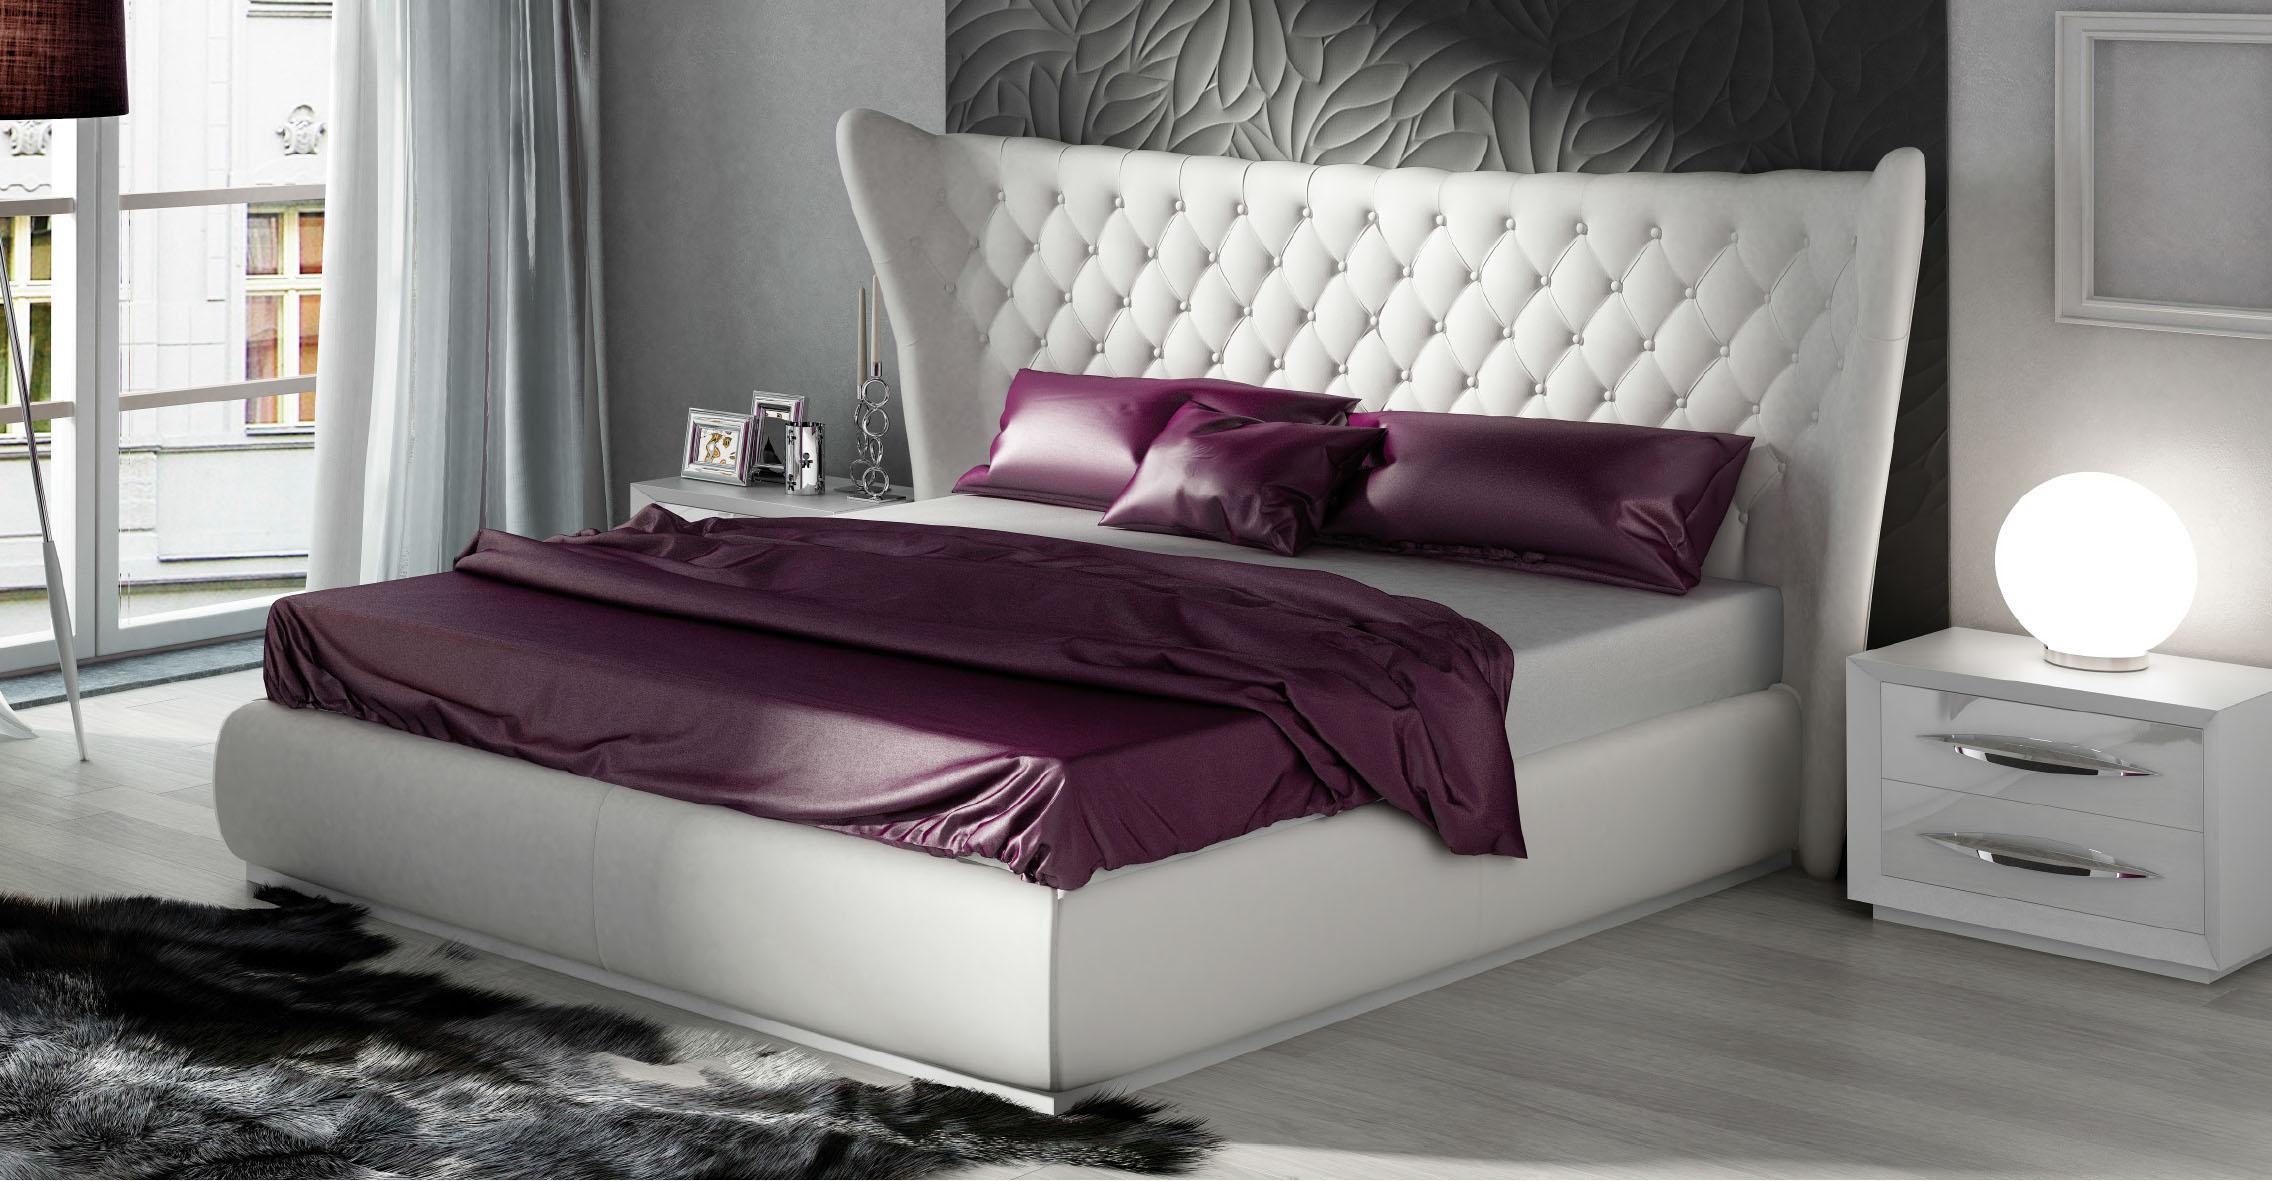 Miami Bedgroup, Modern Bedrooms, Bedroom Furniture